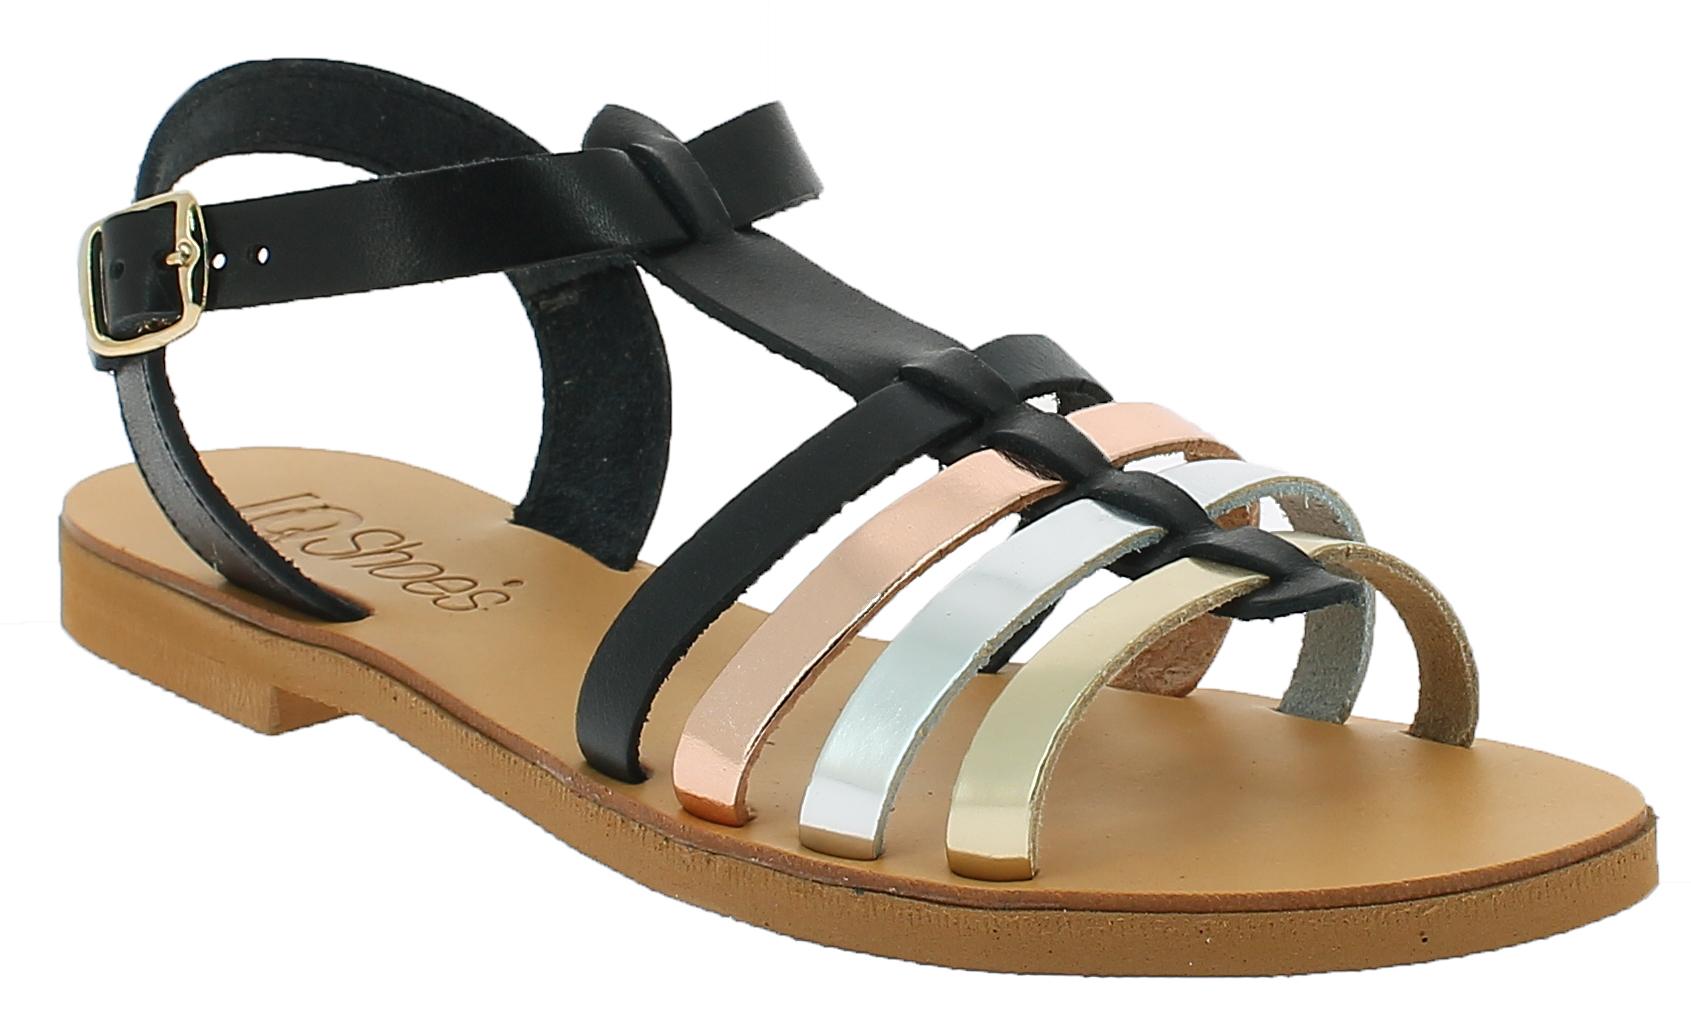 IQSHOES Γυναικείο Πέδιλο 193 Μαύρο - IqShoes - 20.193 black-black-36/1/15/7 παπούτσια  γυναικεία σανδάλια   πέδιλα